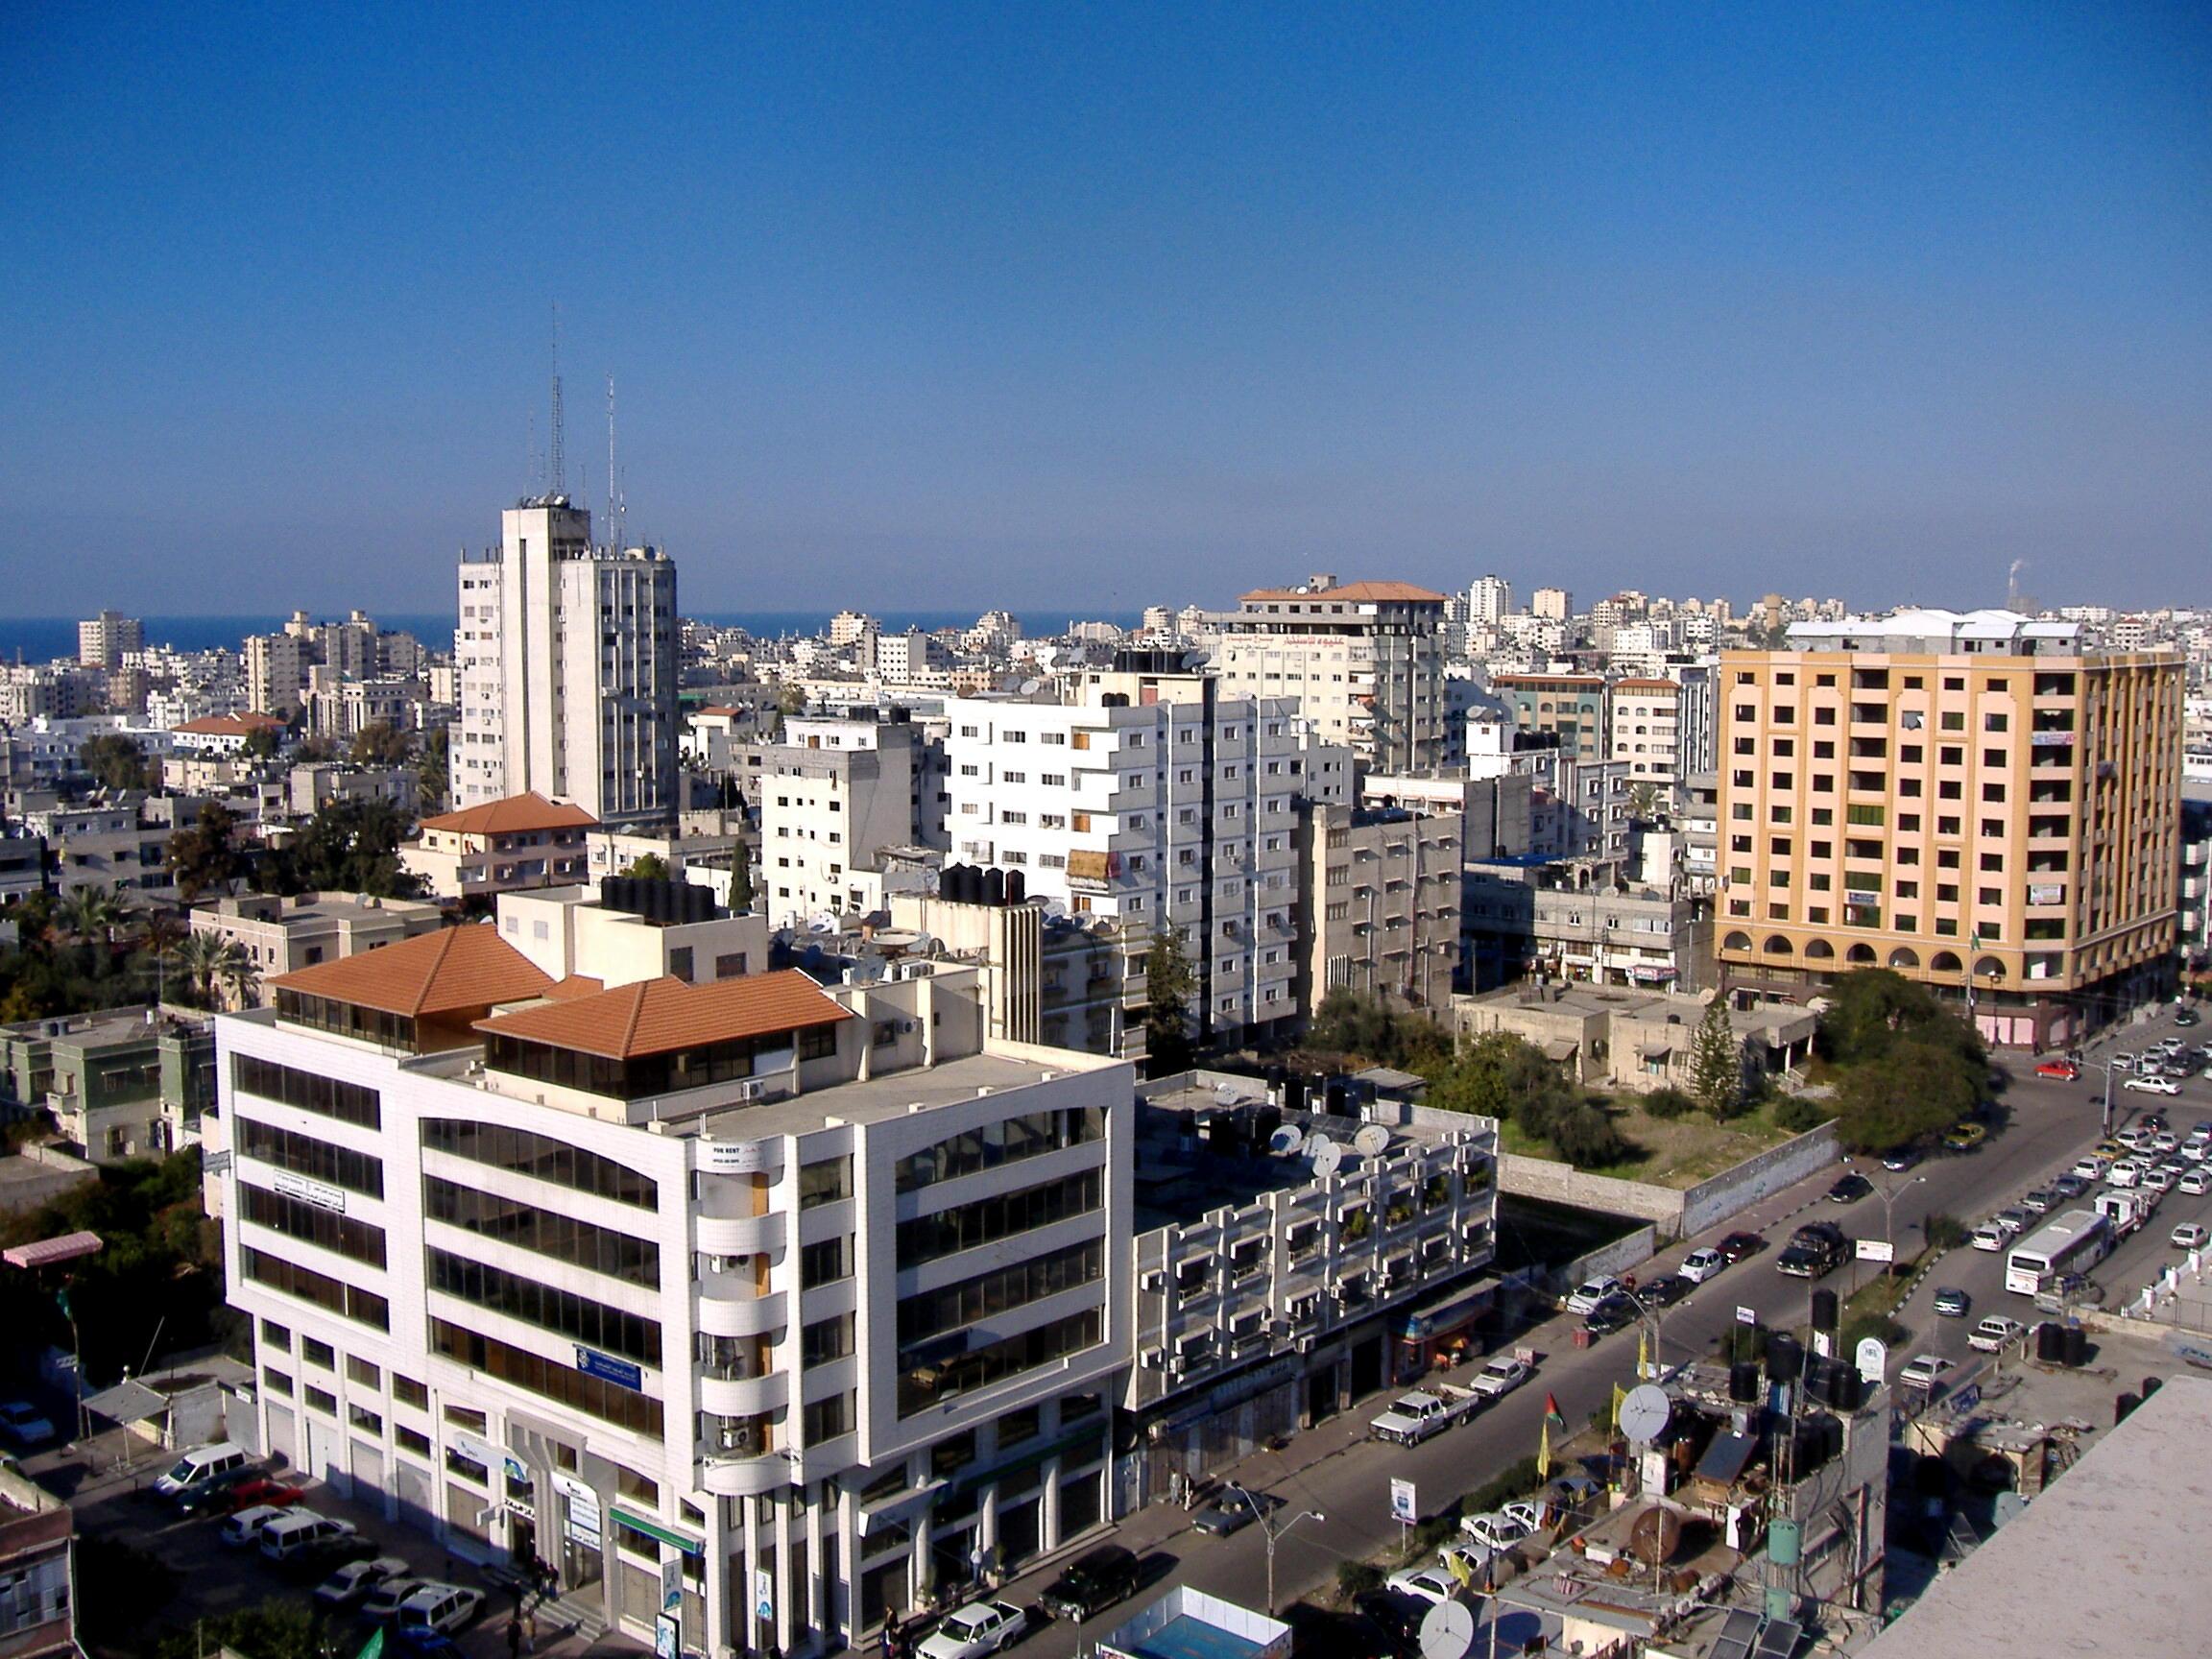 Depiction of Gaza